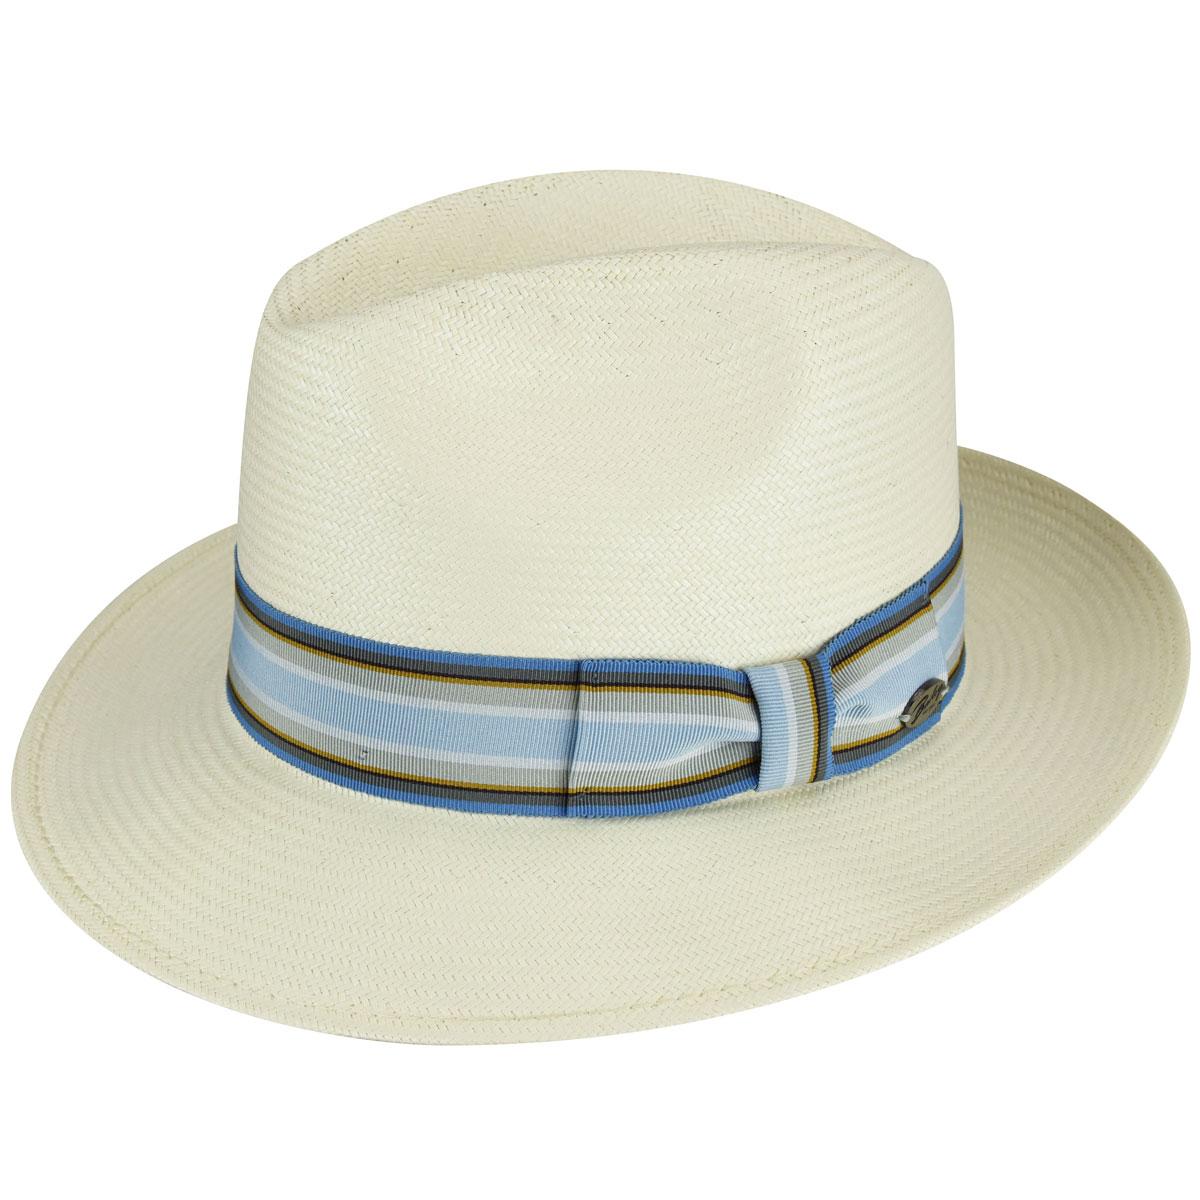 1920s Mens Hats & Caps | Gatsby, Peaky Blinders, Gangster Creel LitestrawFedora $101.25 AT vintagedancer.com